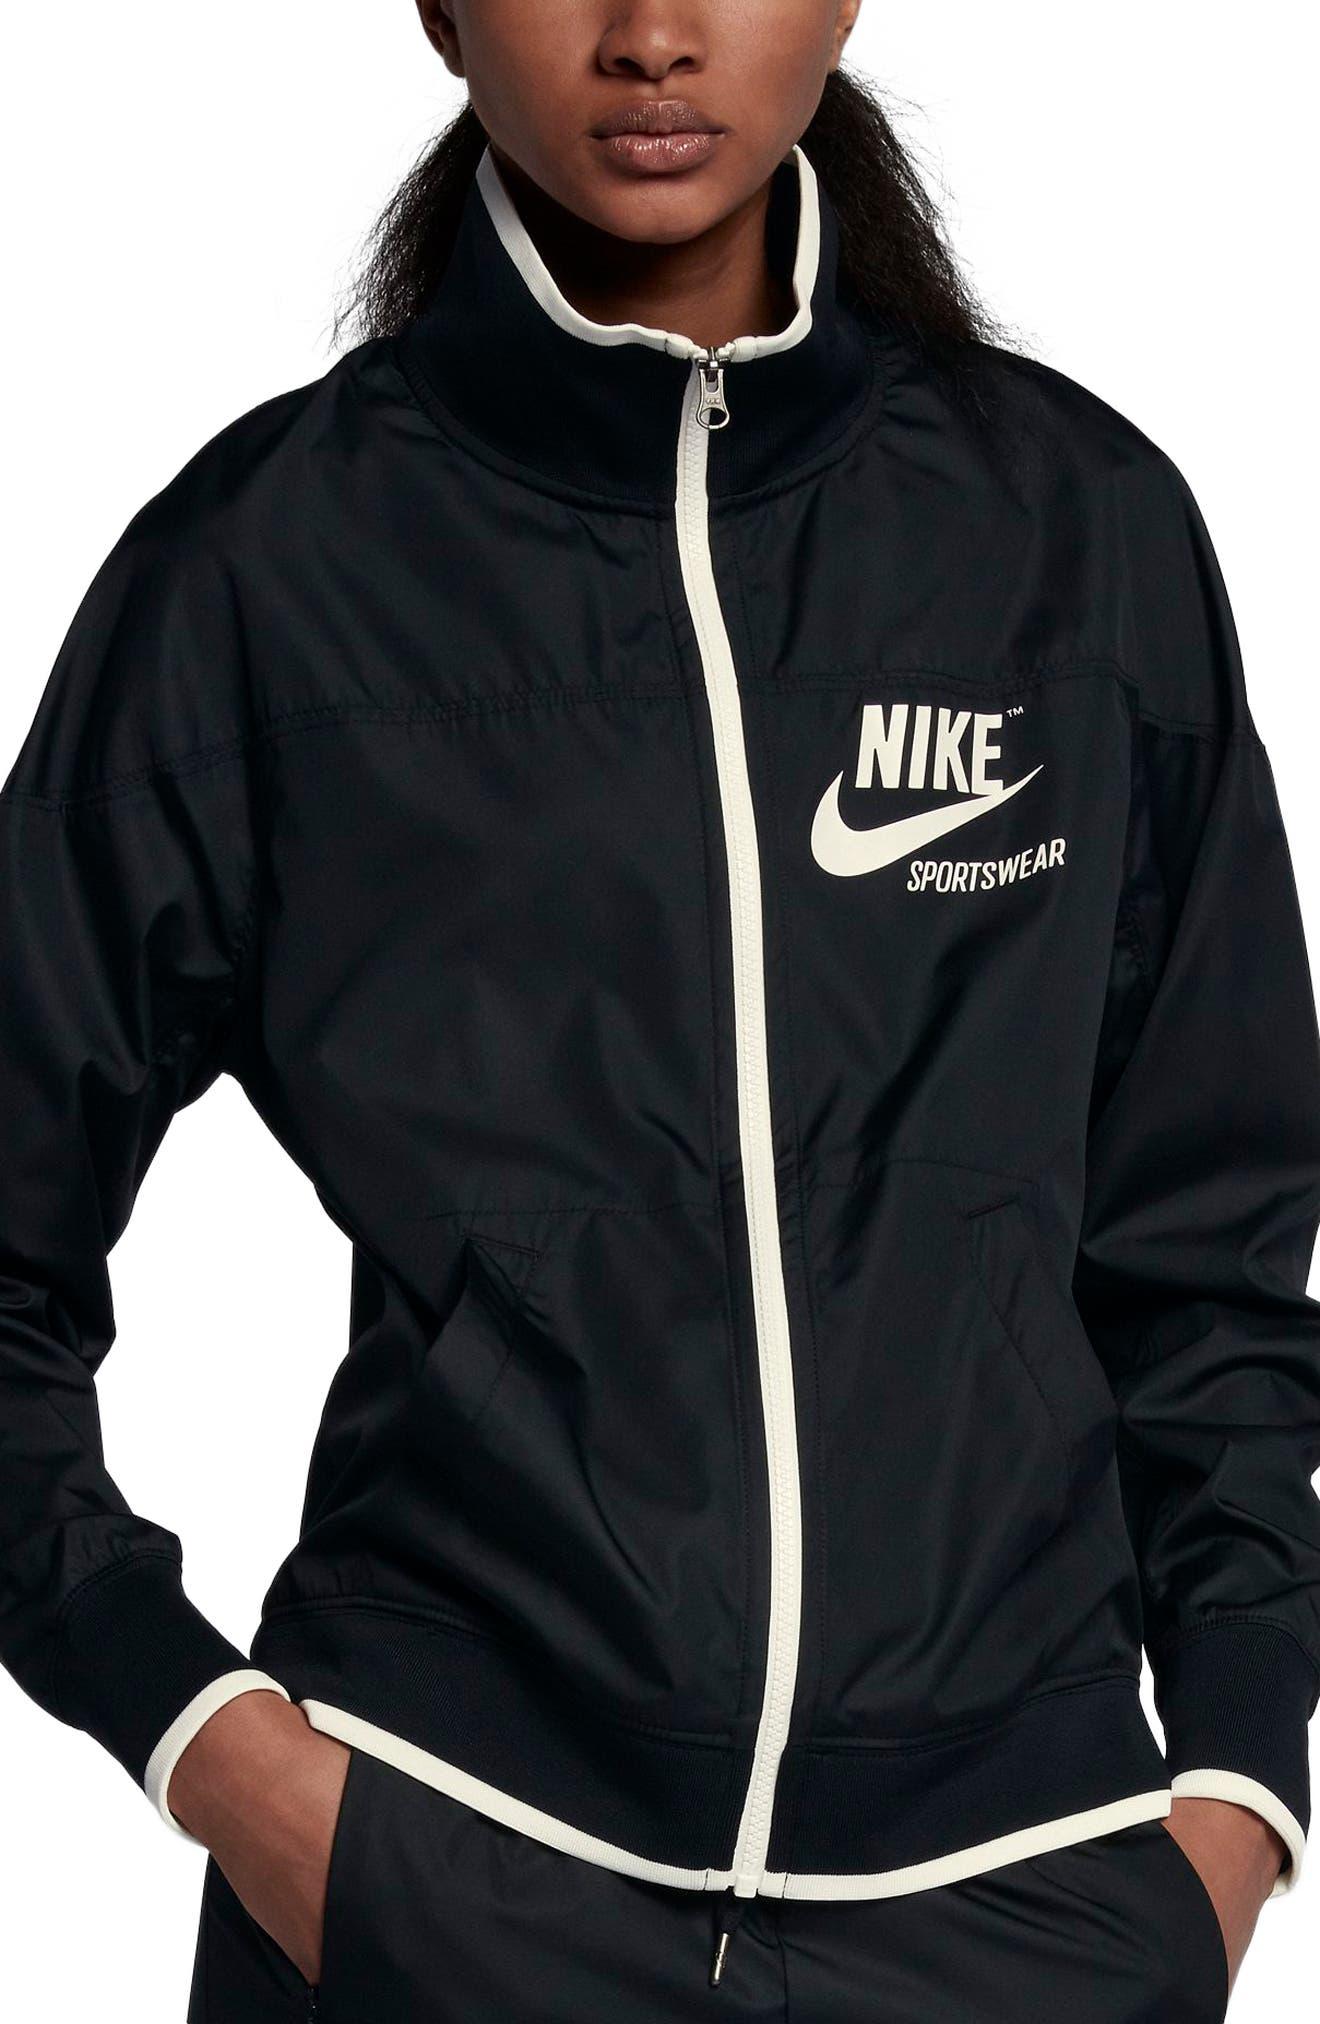 Sportswear Archive Jacket,                         Main,                         color, Black/ Sail